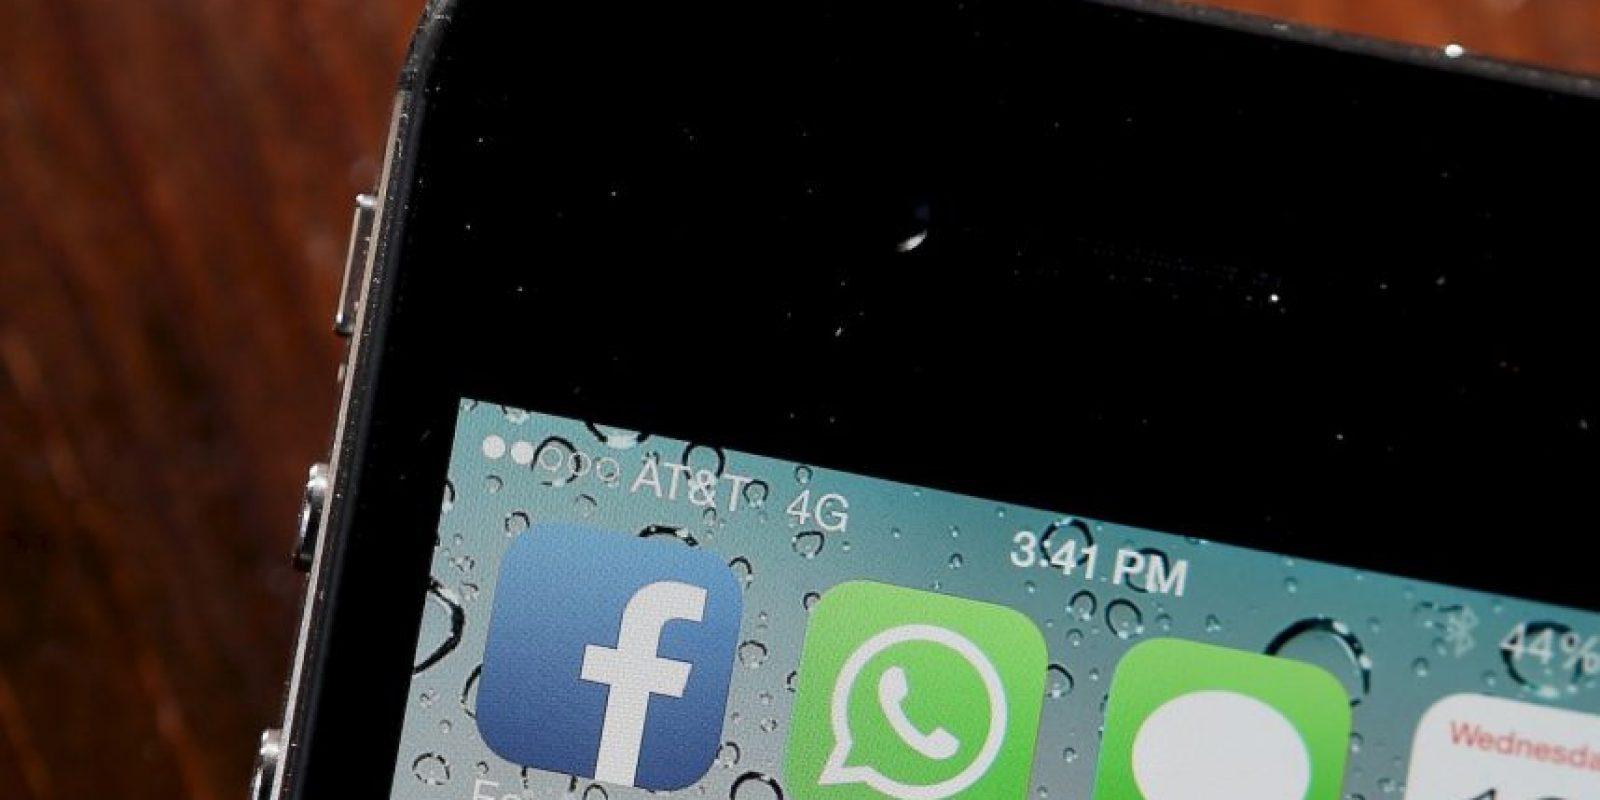 Las 5 estafas más famosas de WhatsApp durante 2015: 1- Nuevos emojis en WhatsApp. Foto:Tumblr